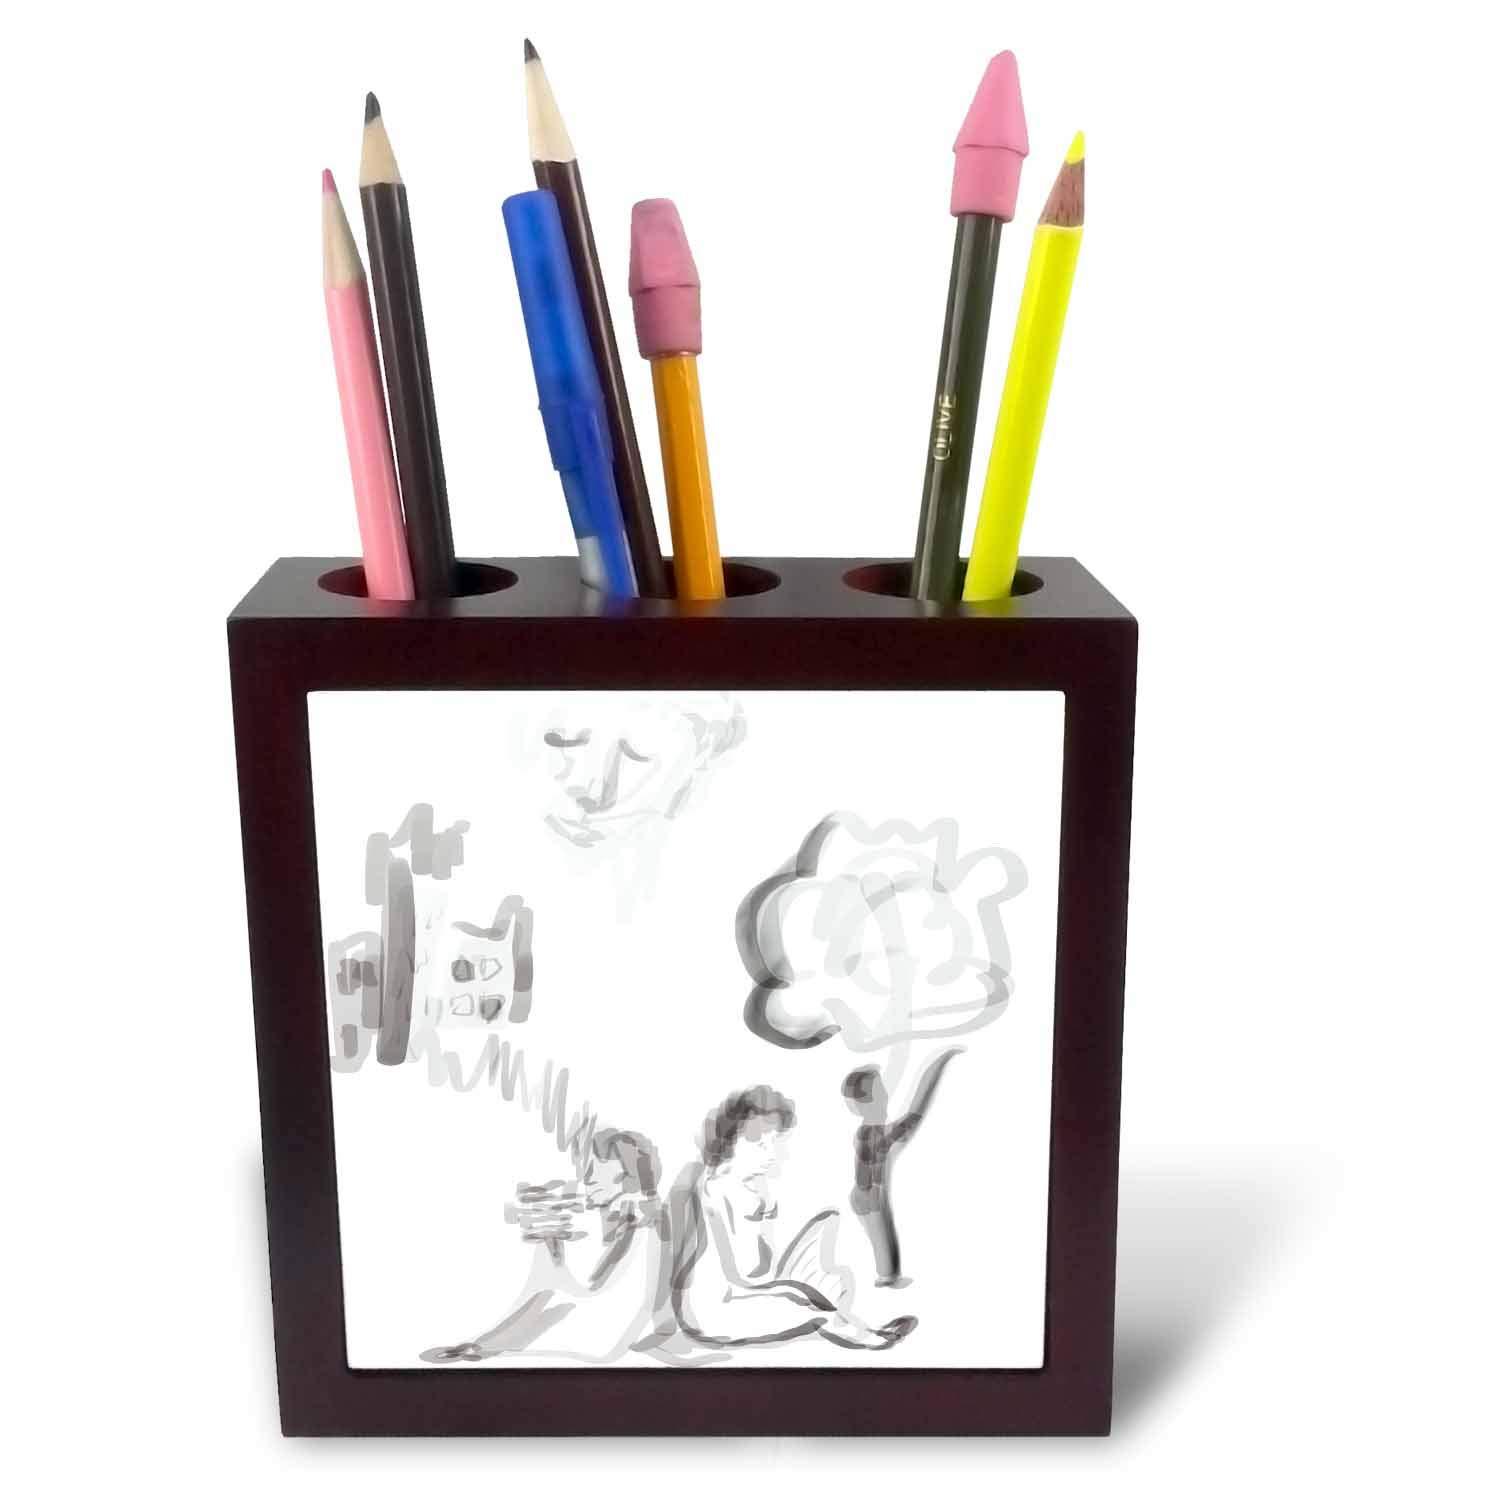 3dRose Lasha Beraia - Minimalist - Movie Makers - 5 inch Tile Pen Holder (ph_288696_1)